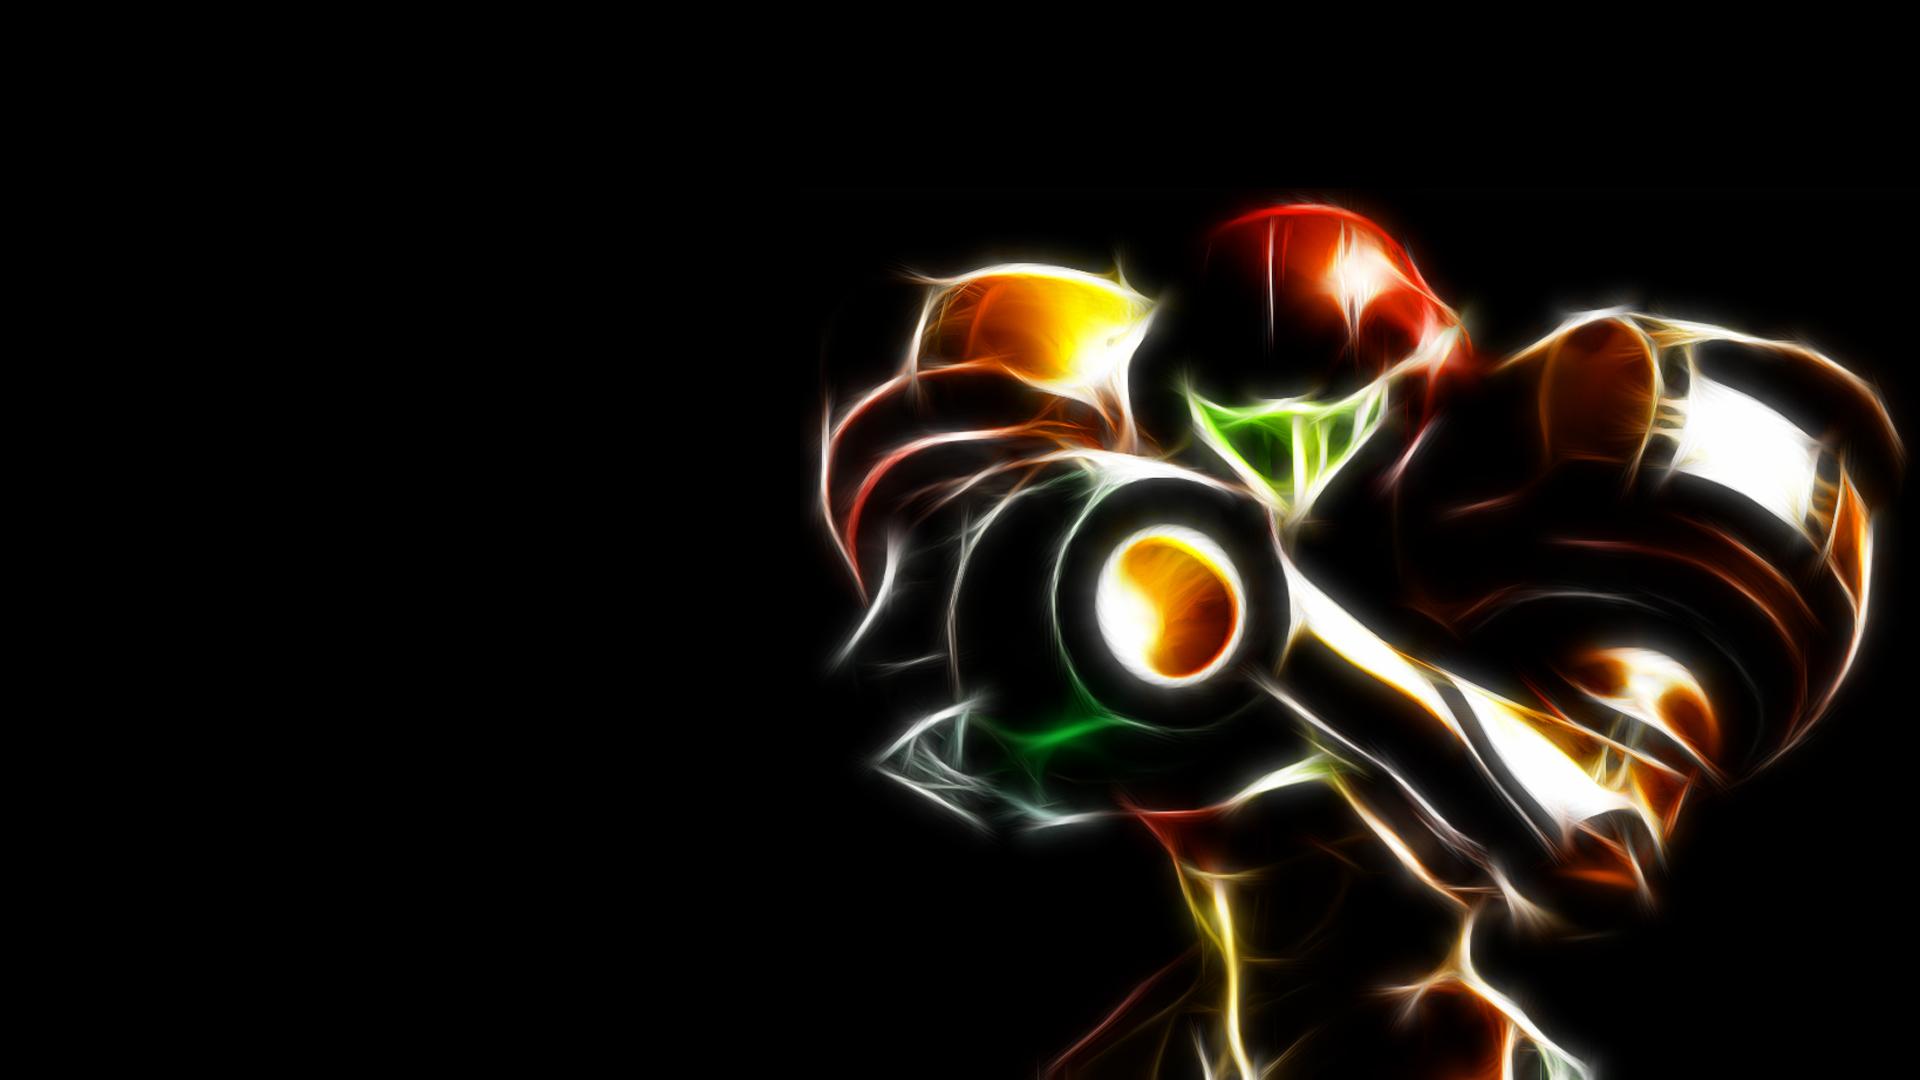 Fusion Fall Wallpaper Hd Metroid Hd Backgrounds Pixelstalk Net